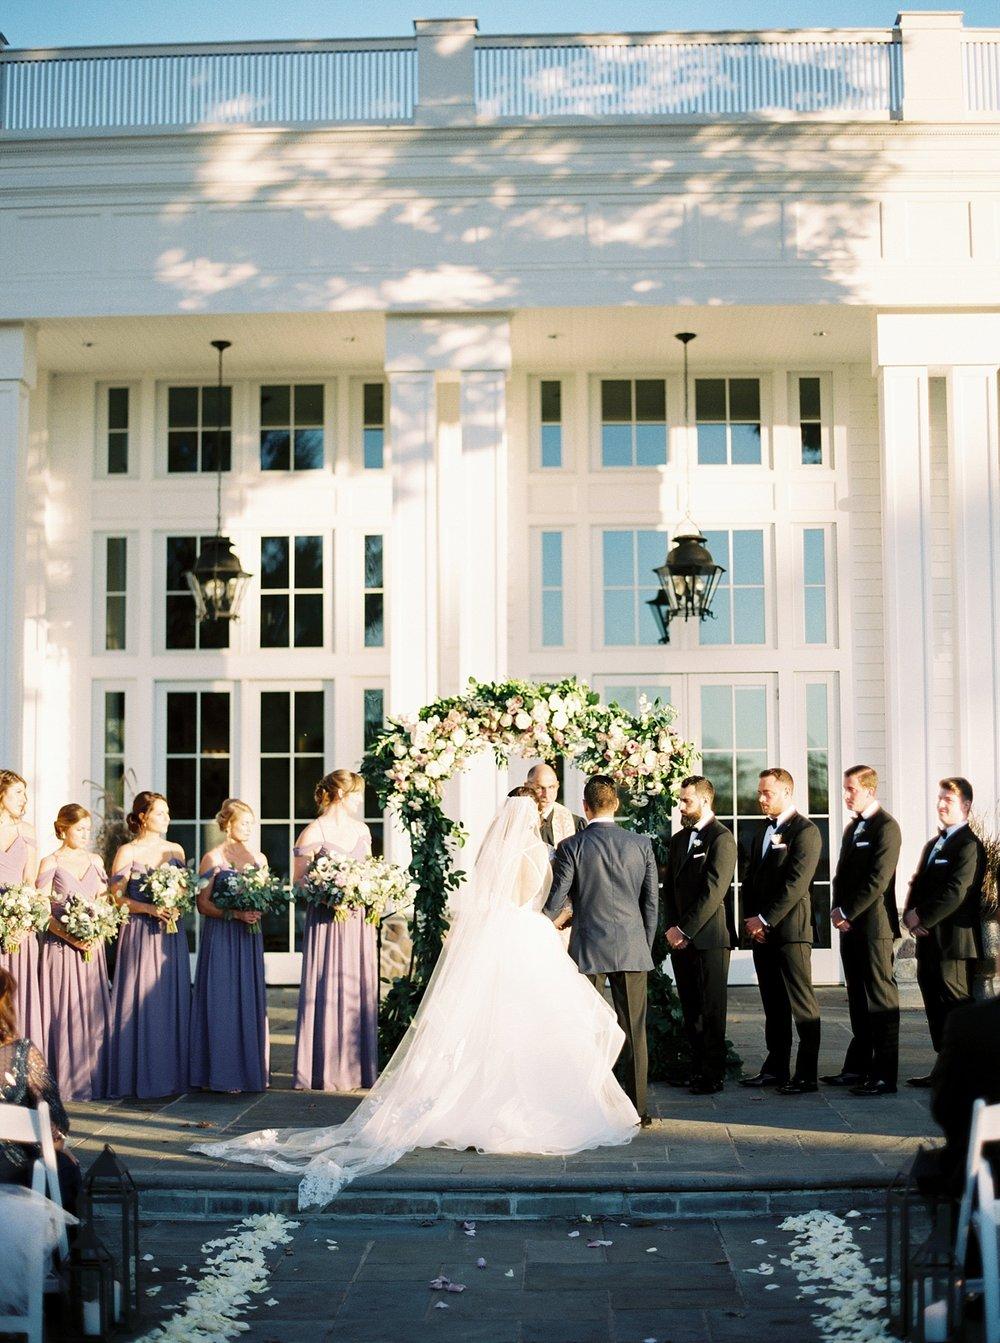 ryland_inn_nj_wedding_photography_0033.jpg